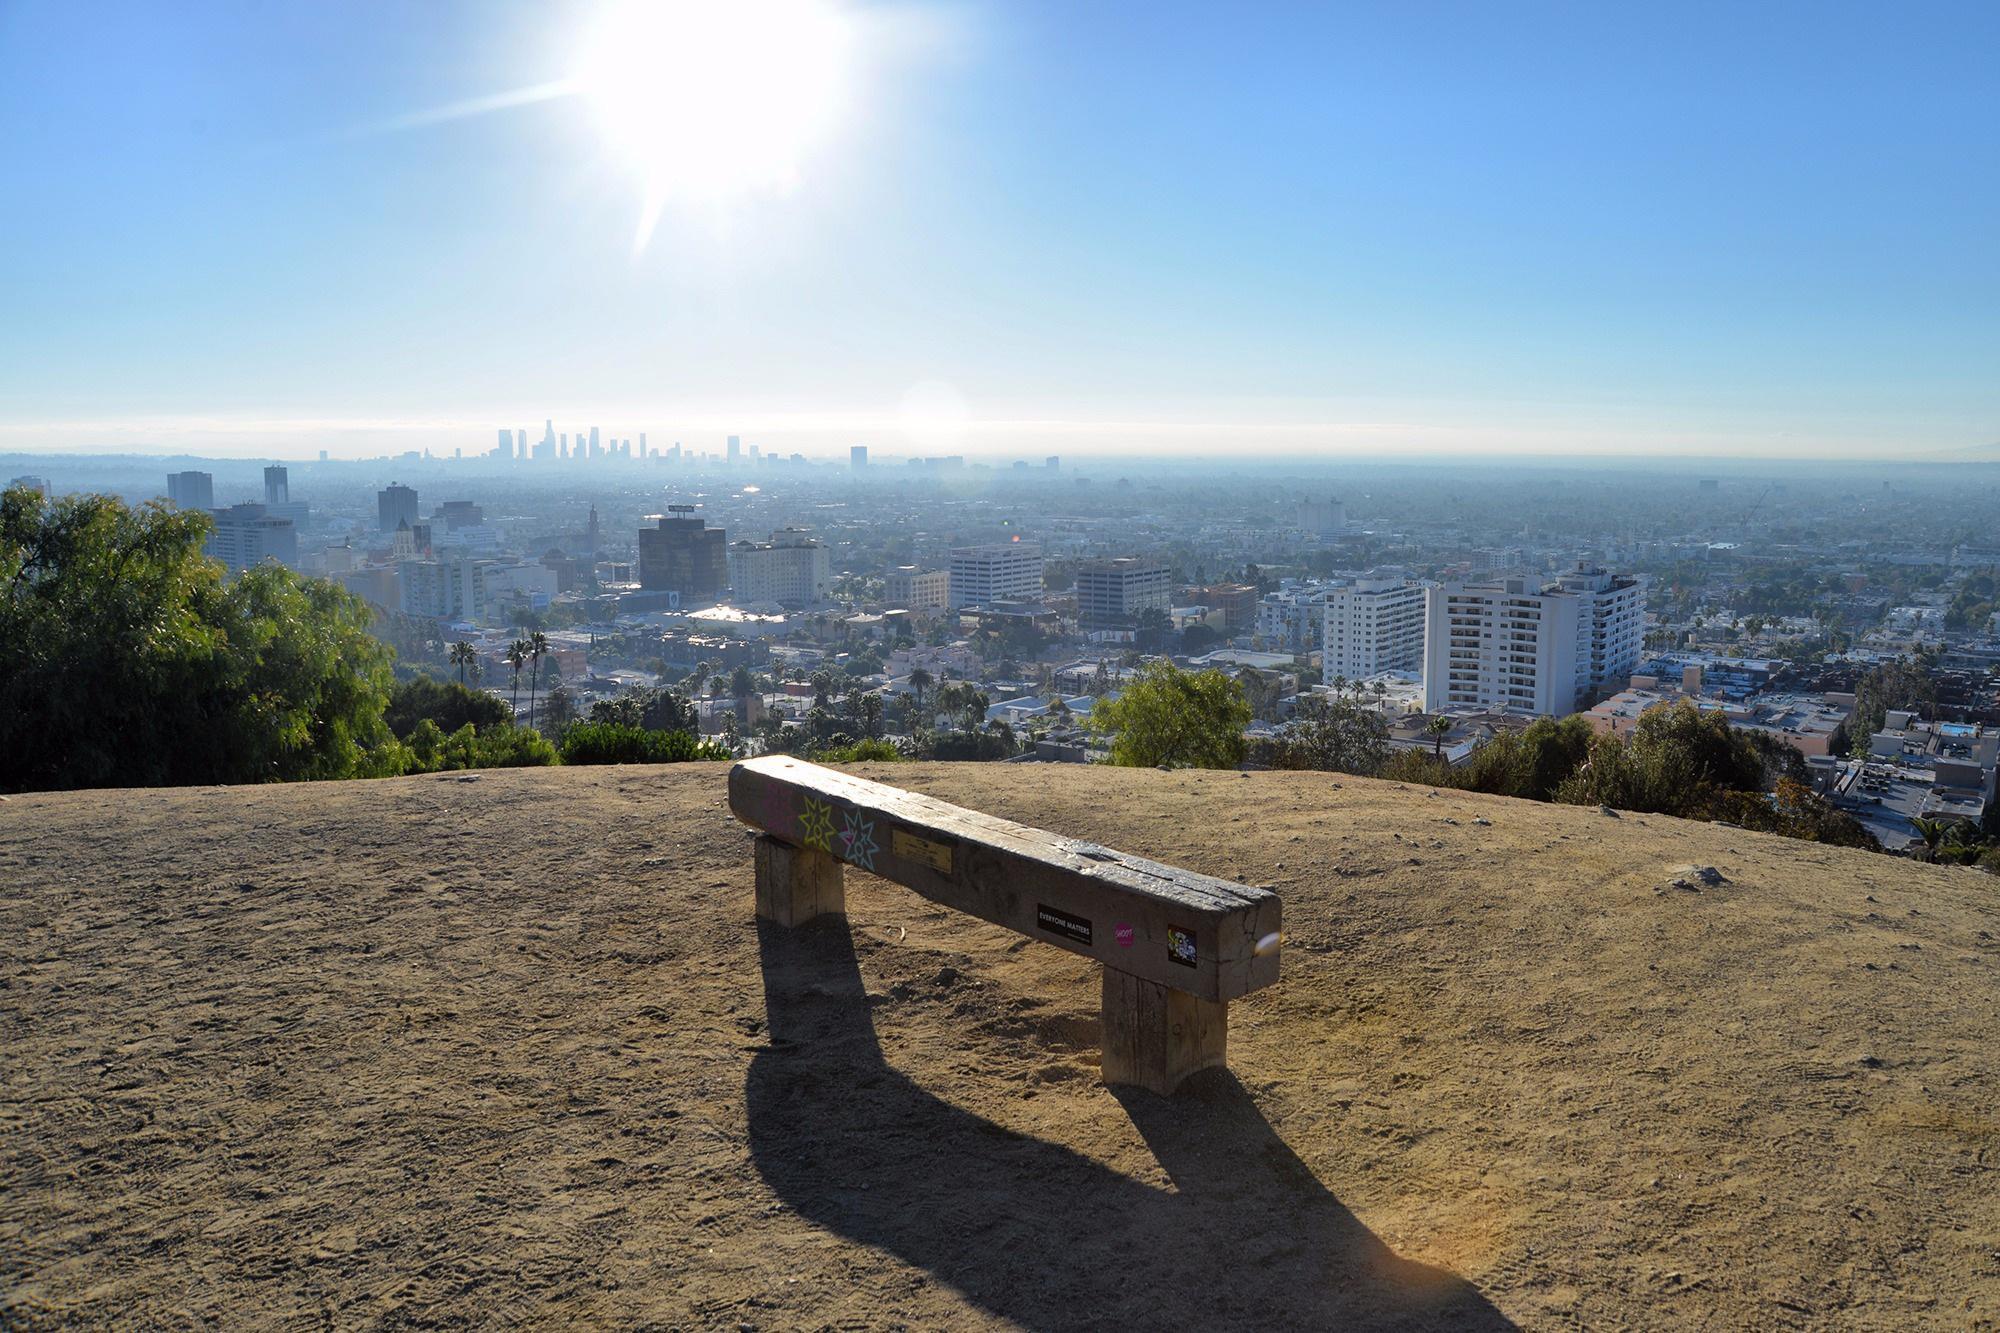 Раньон Кэньон парк, Лос-Анджелес, США